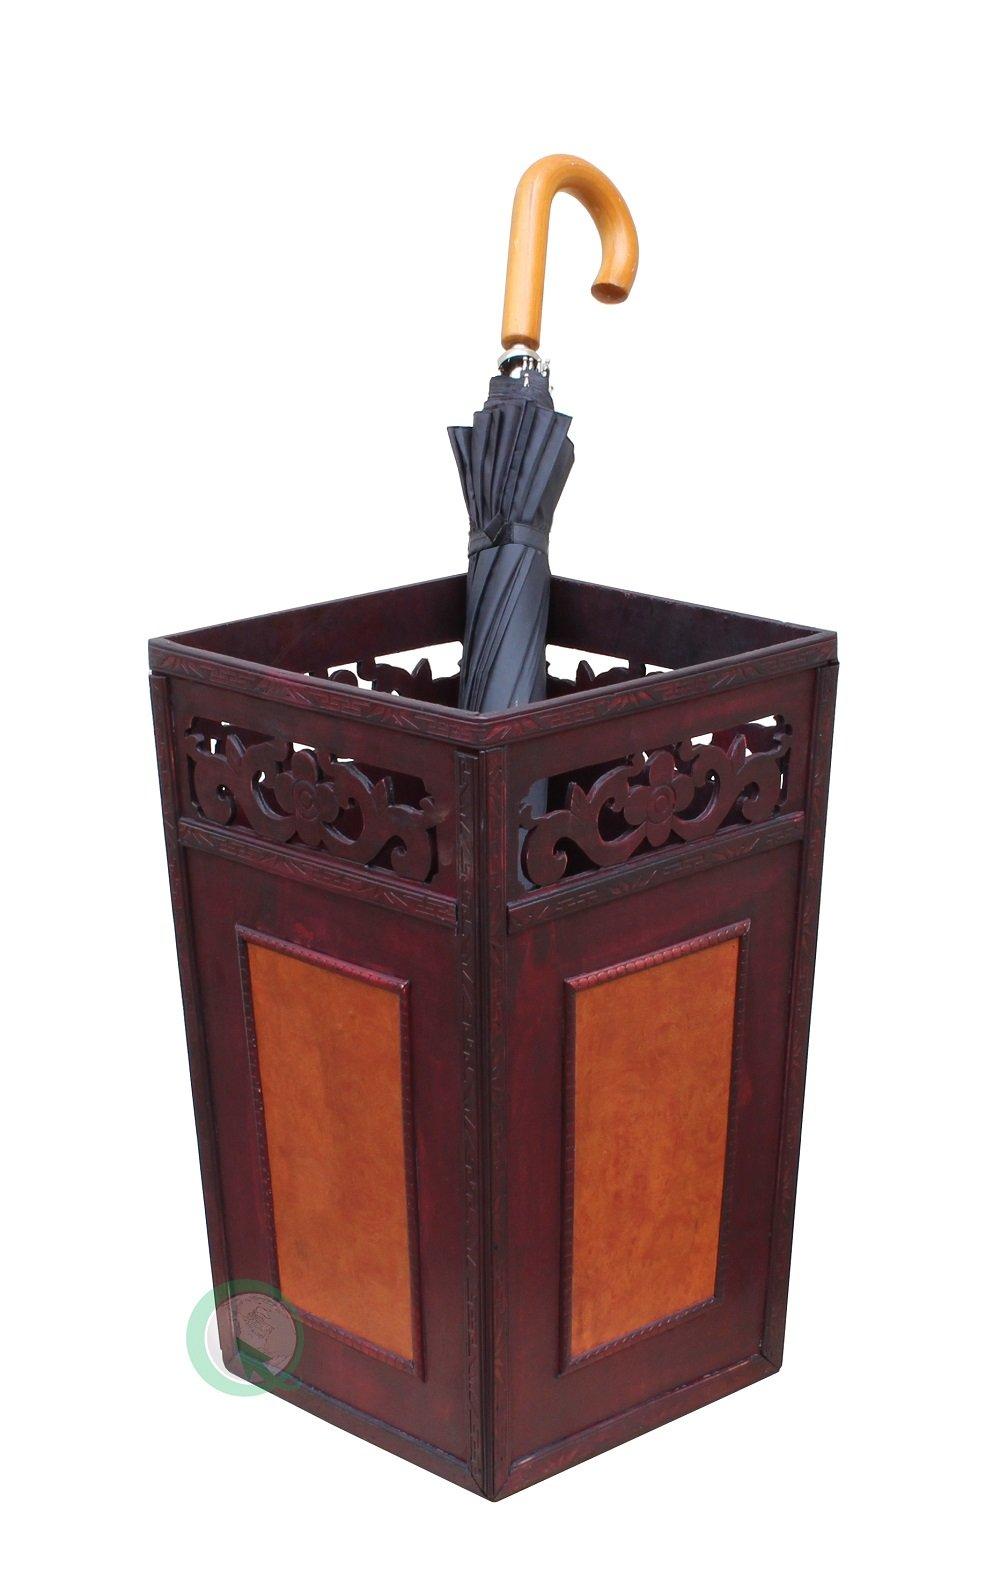 Vintiquewise(TM Handcrafted Umbrella Holder